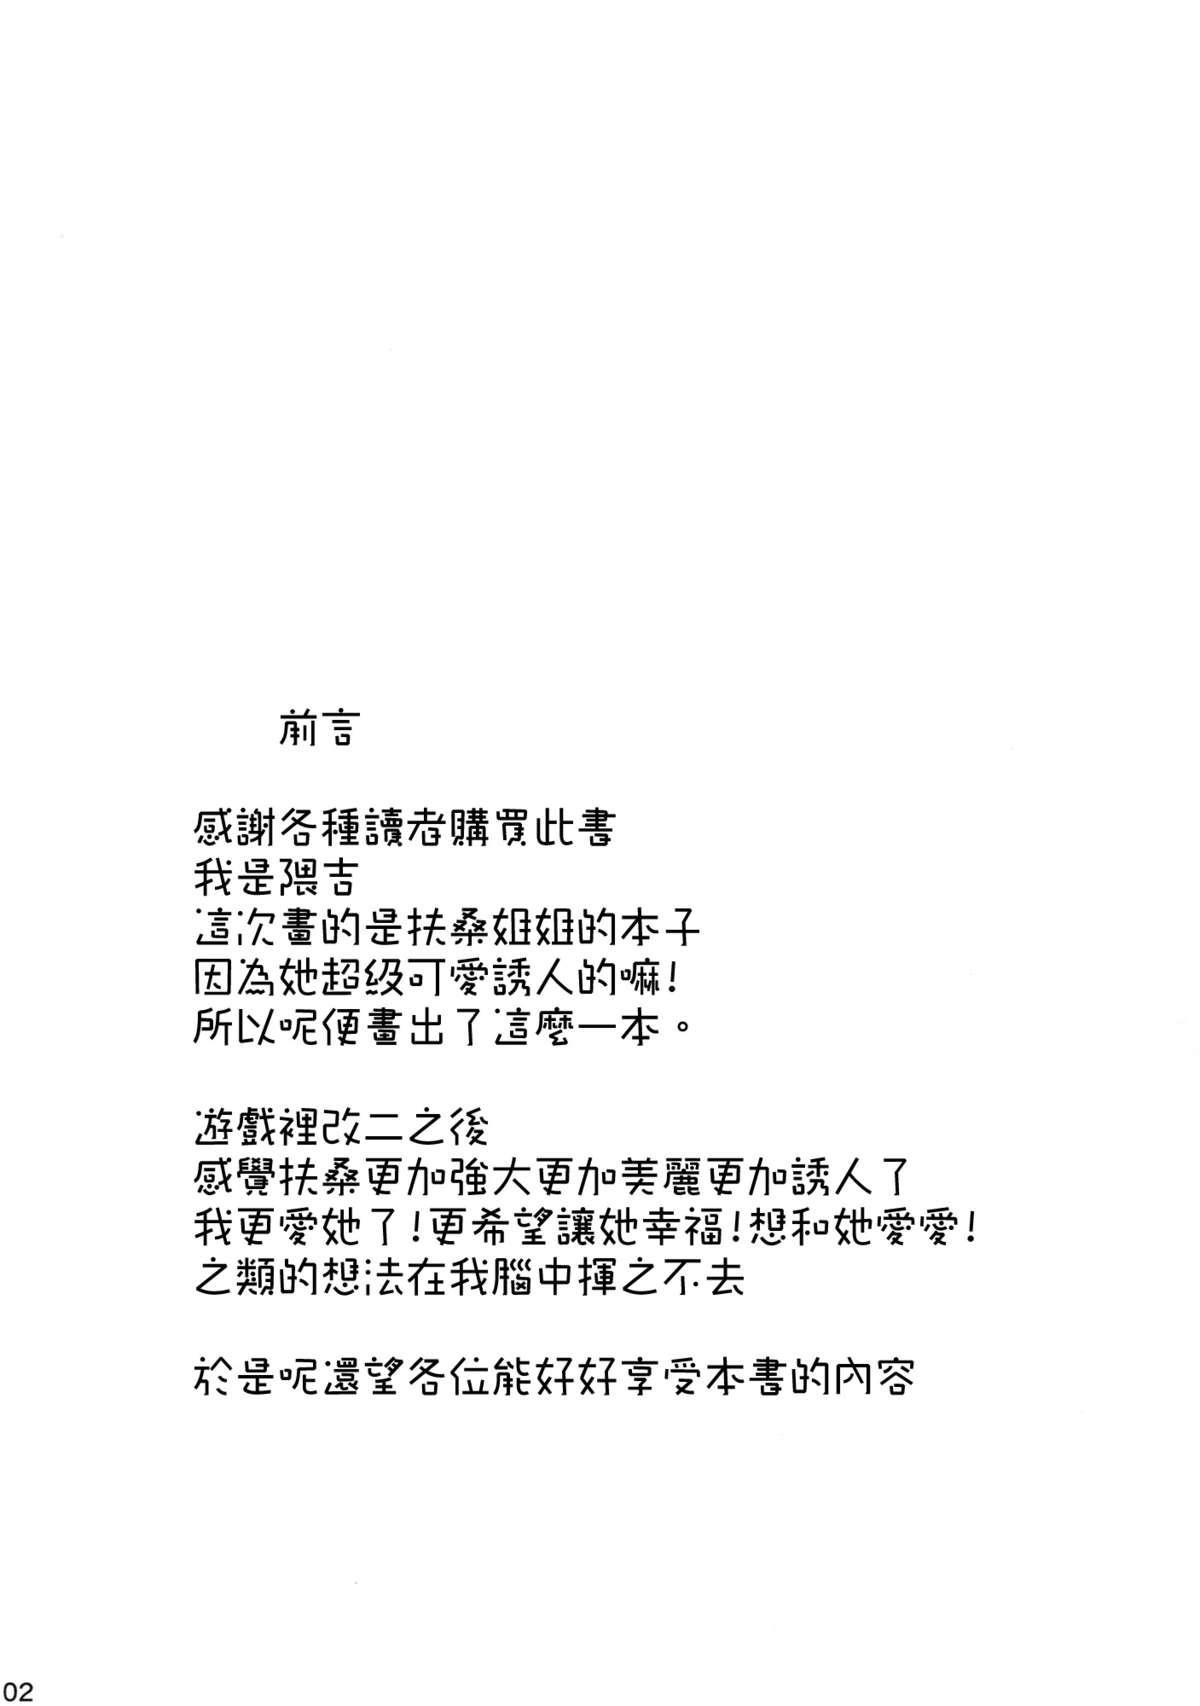 Fuso Kekkon-Seikatu 3